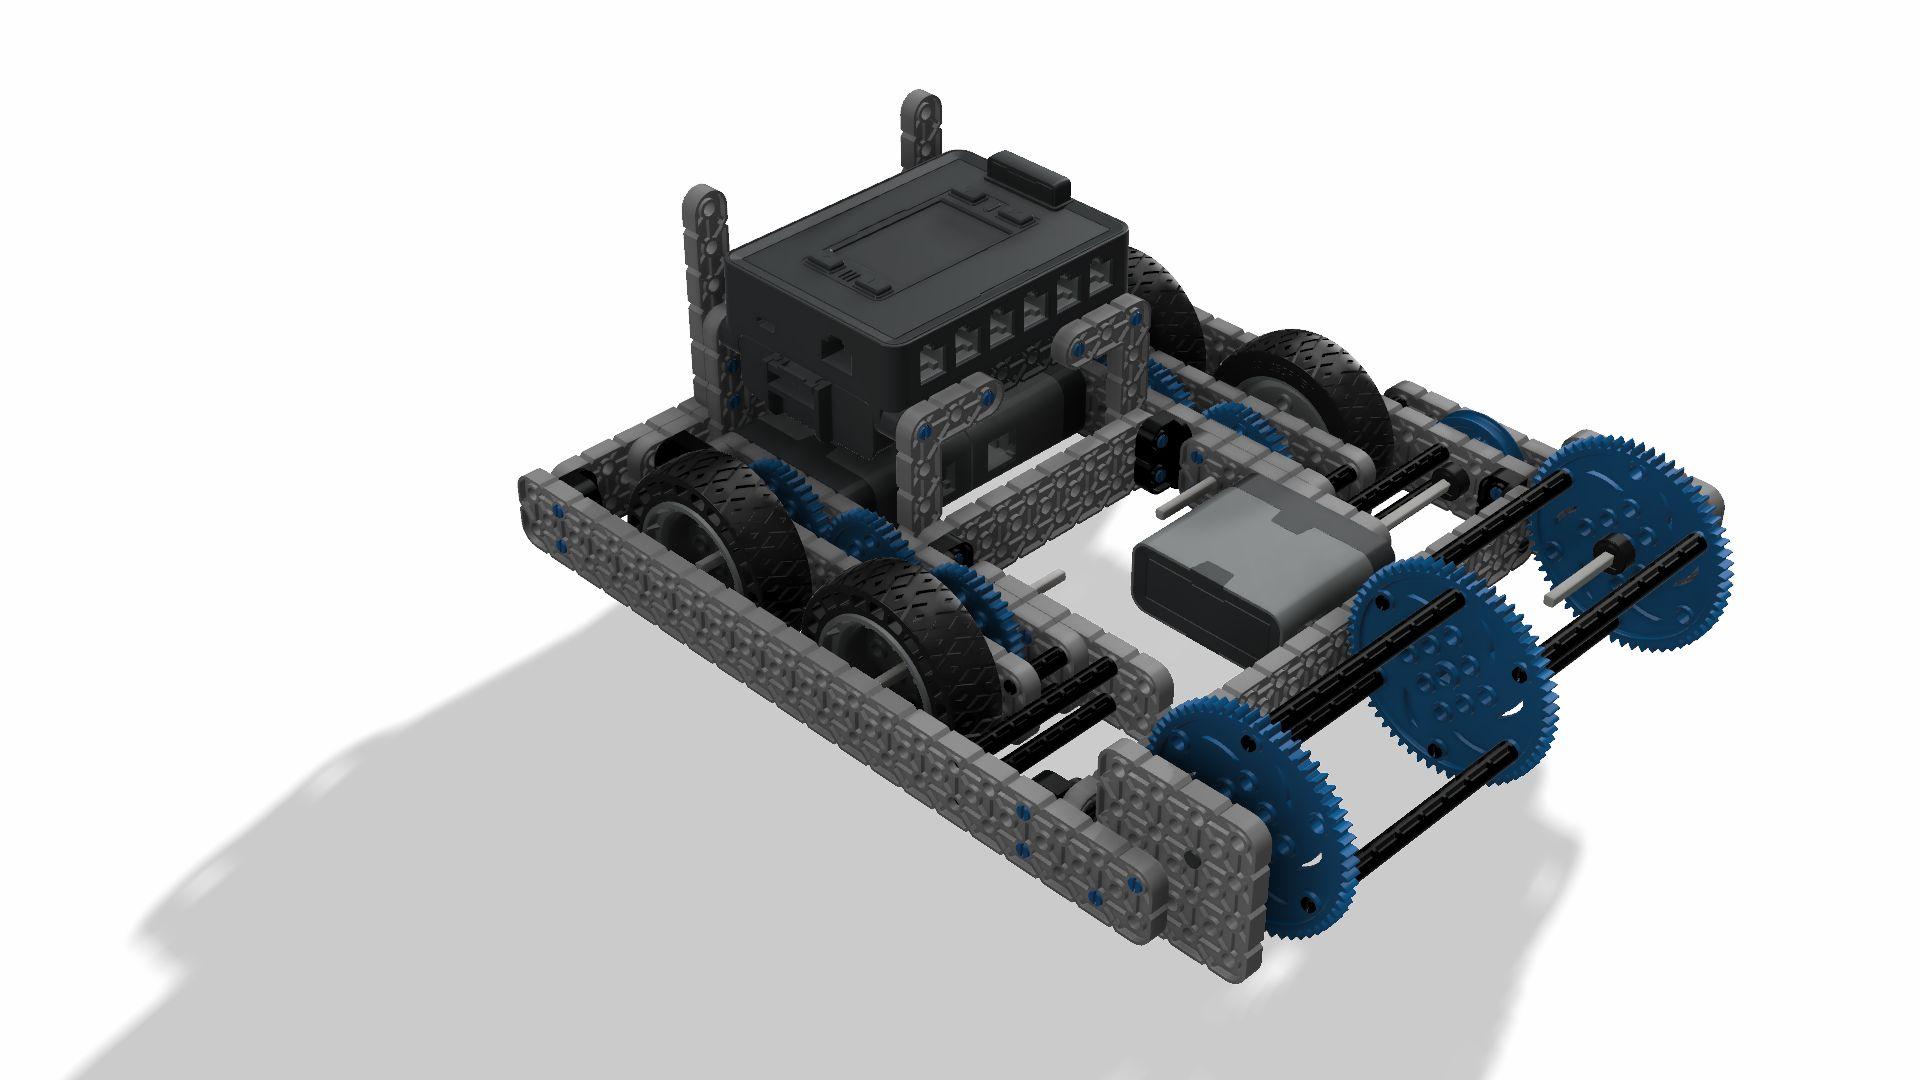 Standard-drive-base-2-v11-v21qwre-3500-3500